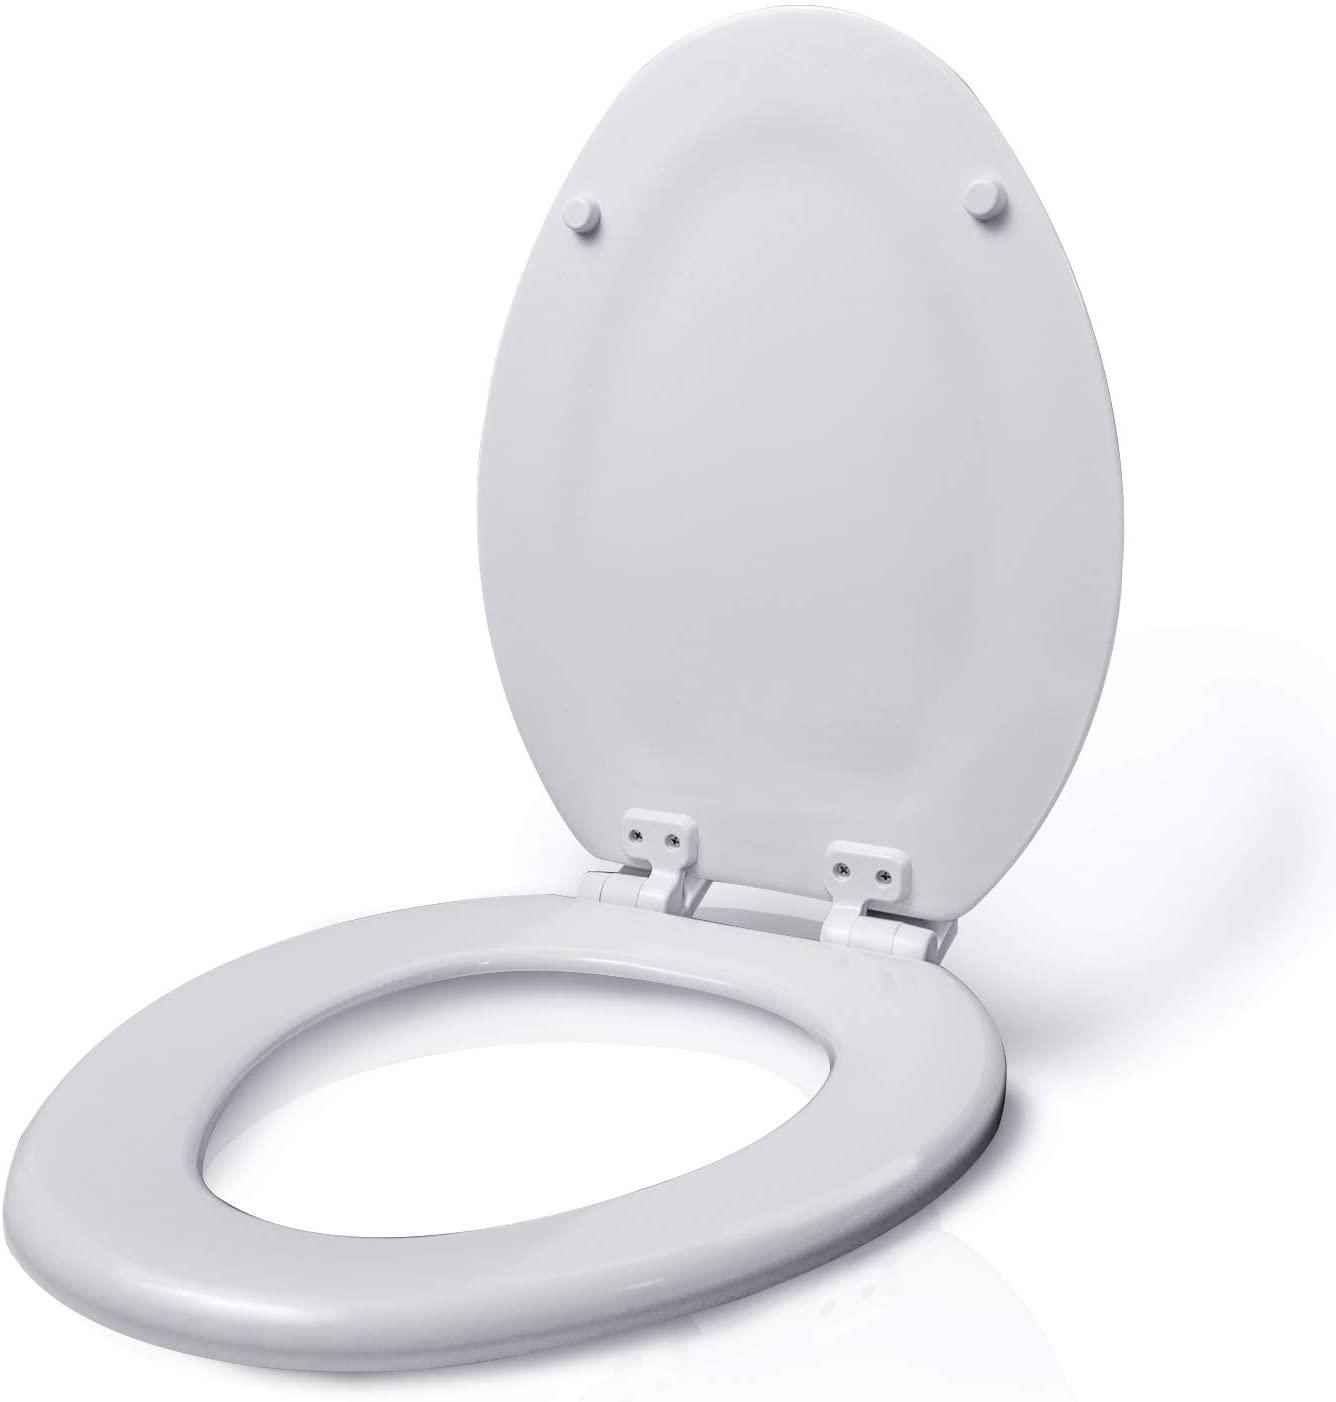 Highcraft W2TSWE Elongated Molded Wood Toilet Seat Easy Remove ∙ Adjustable Hinge, White